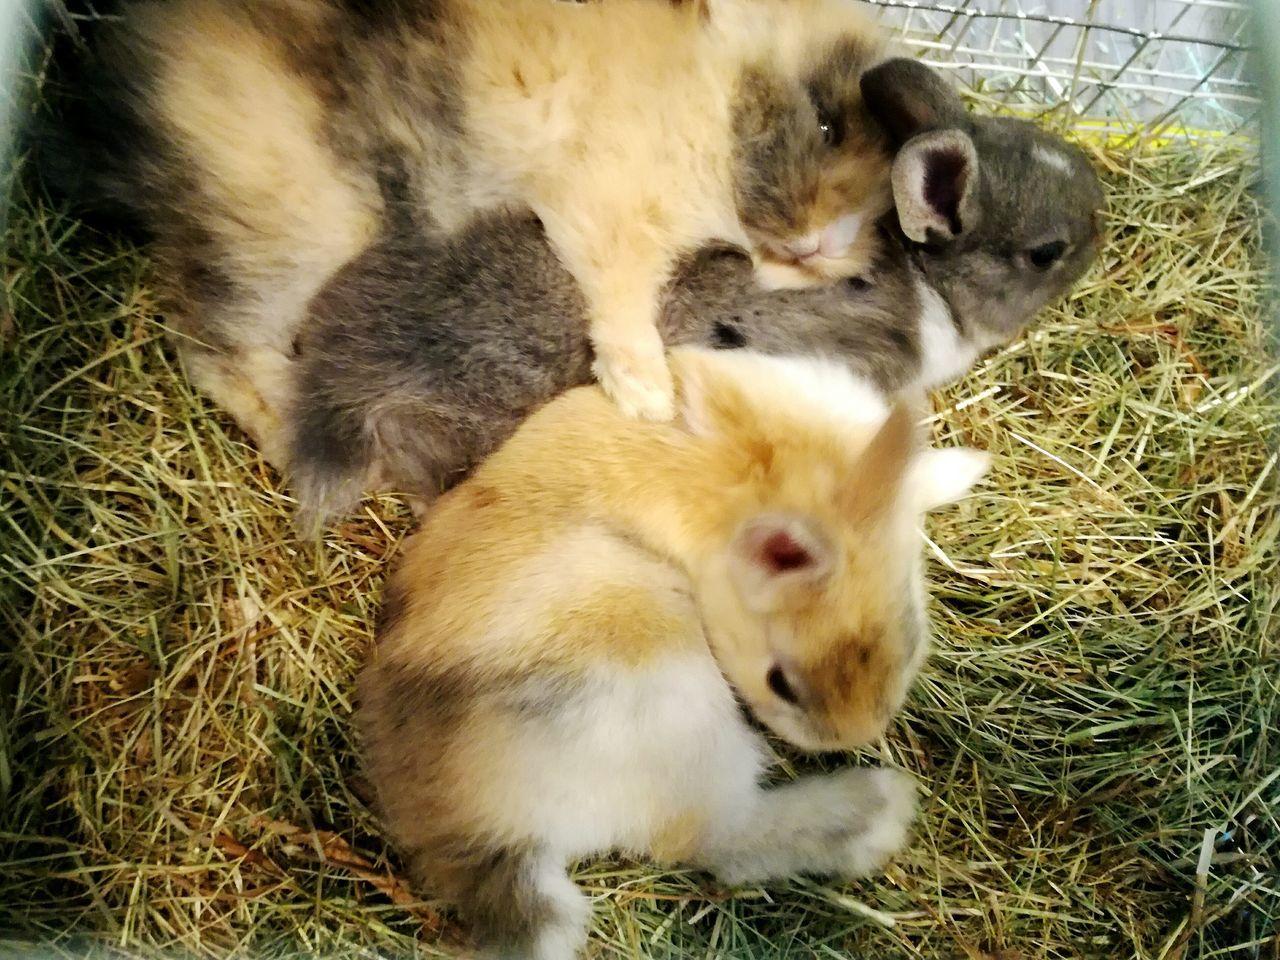 Animal Themes Young Animal Animal Family Togetherness Close-up Rabbit - Animal Domestic Animals Rabbit ❤️ Rabbit 🐇 Colors